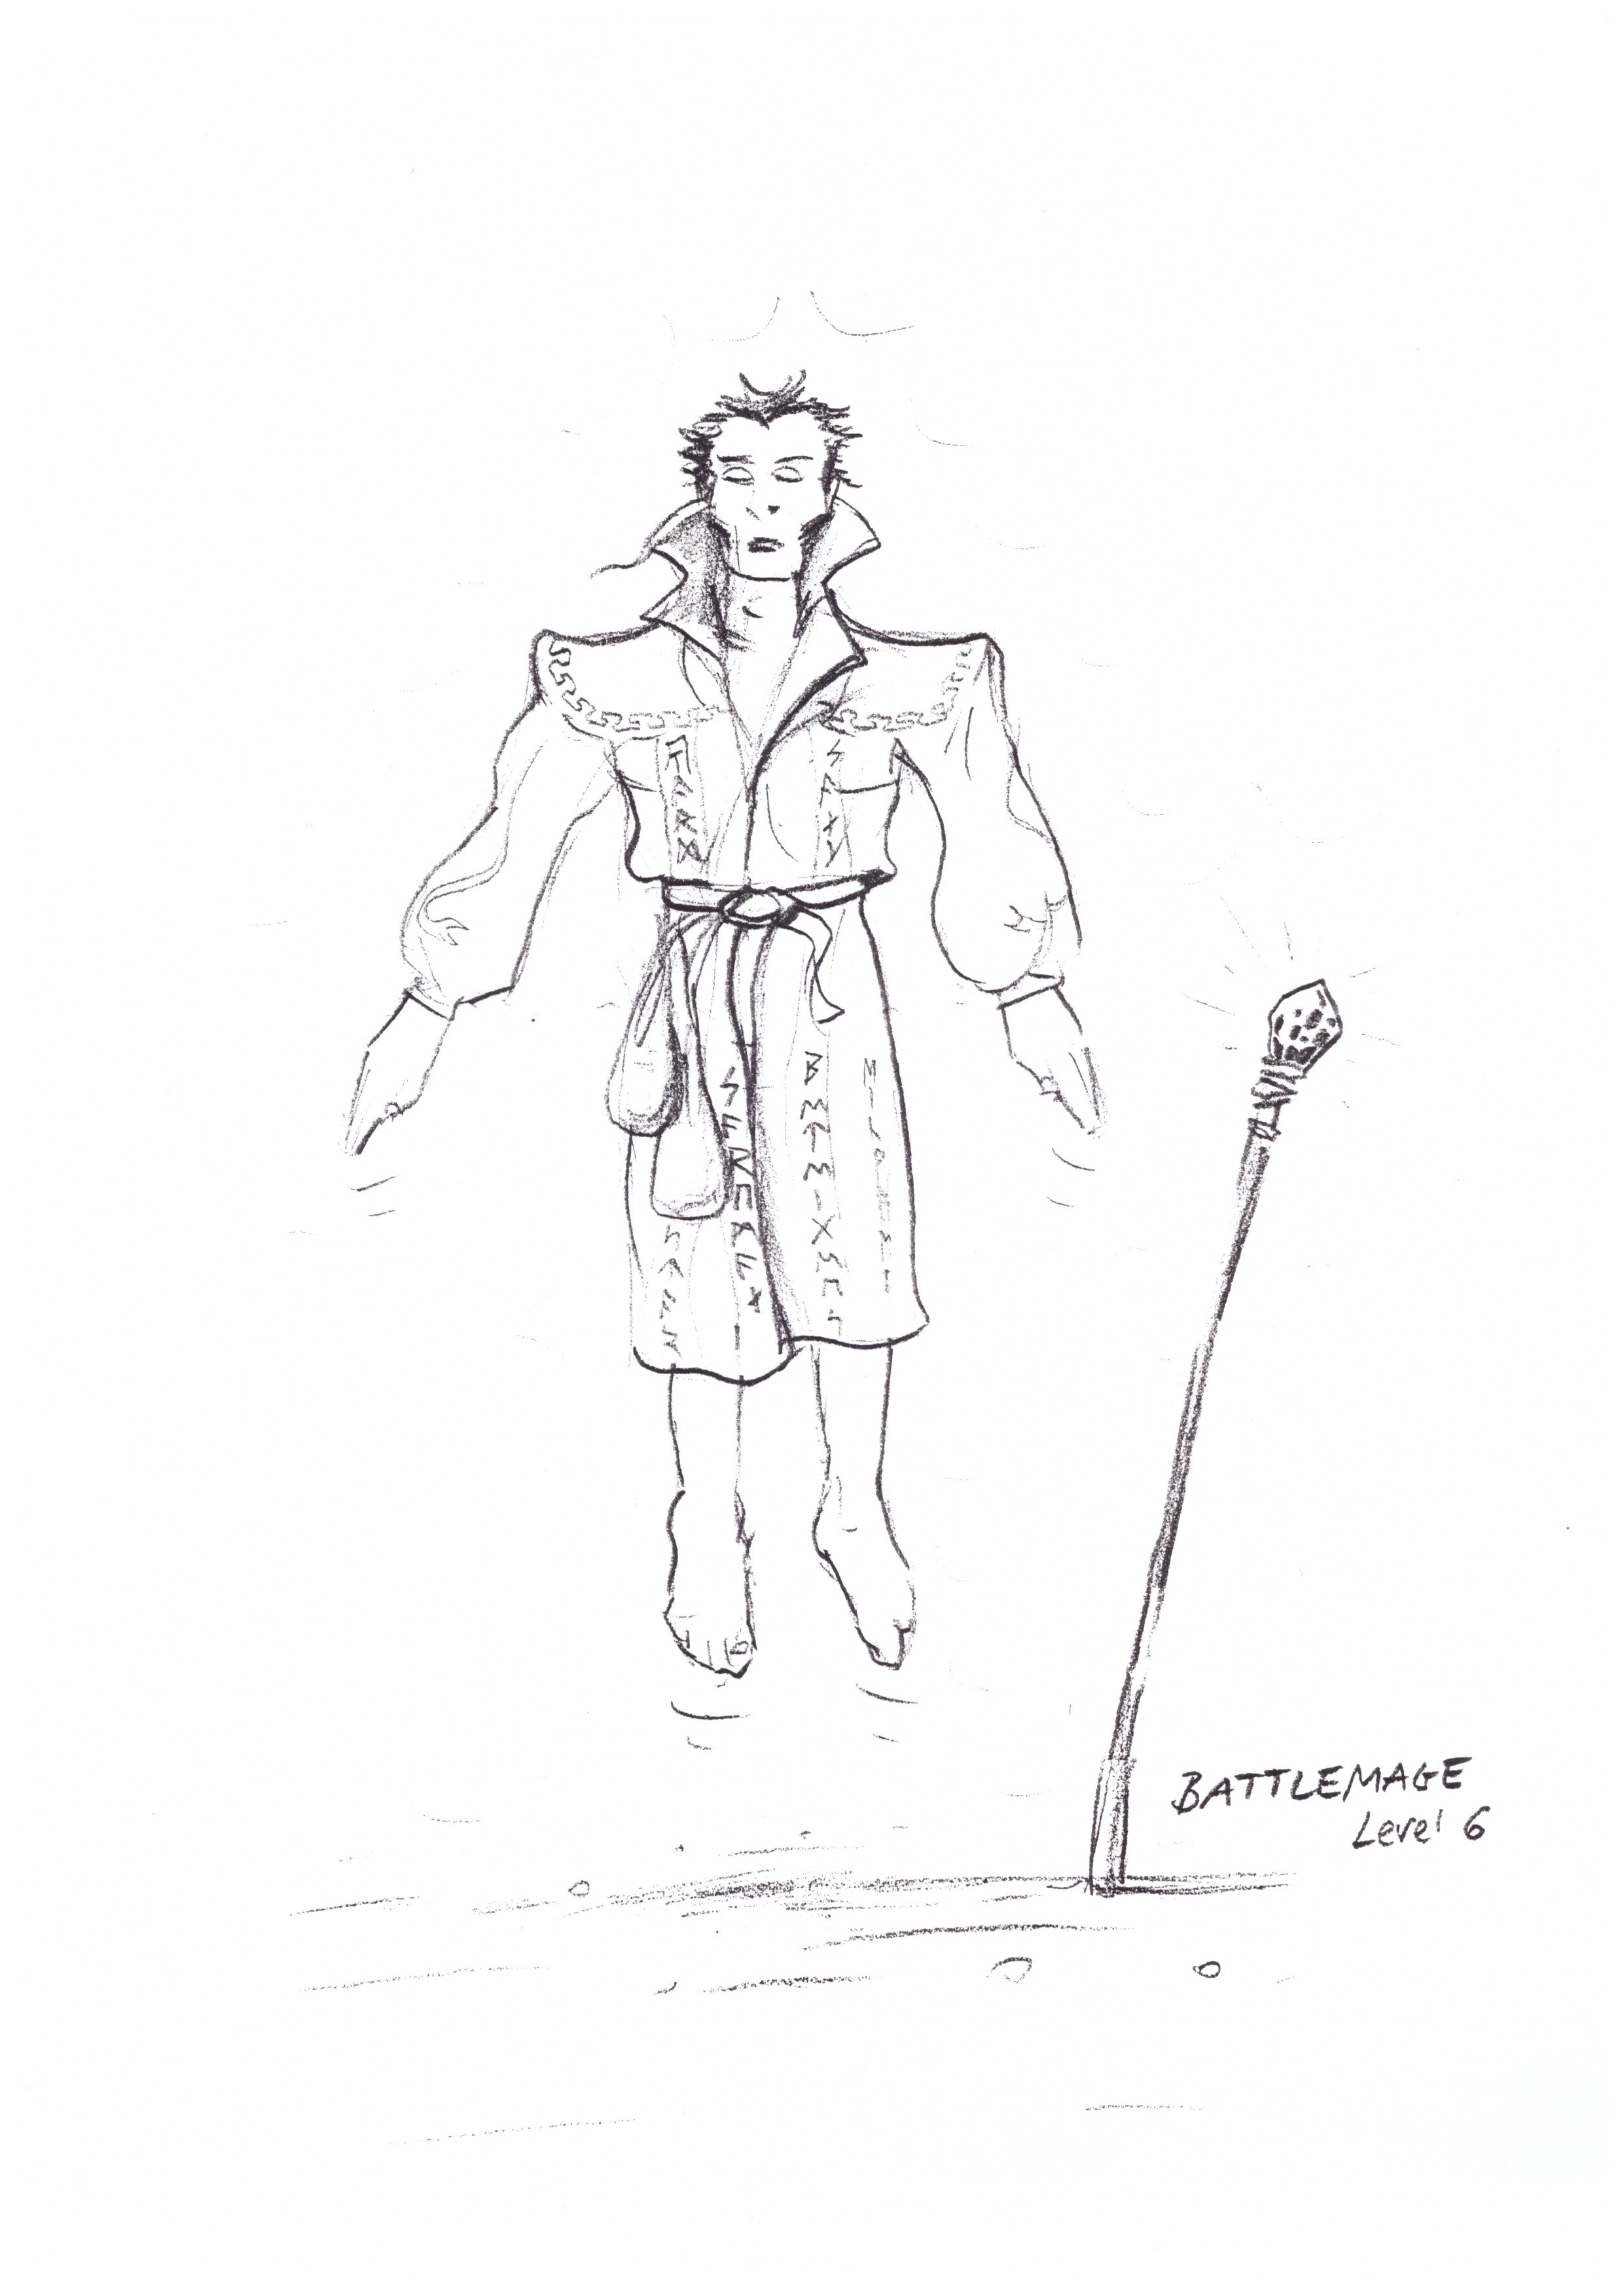 Battlemage Sketch